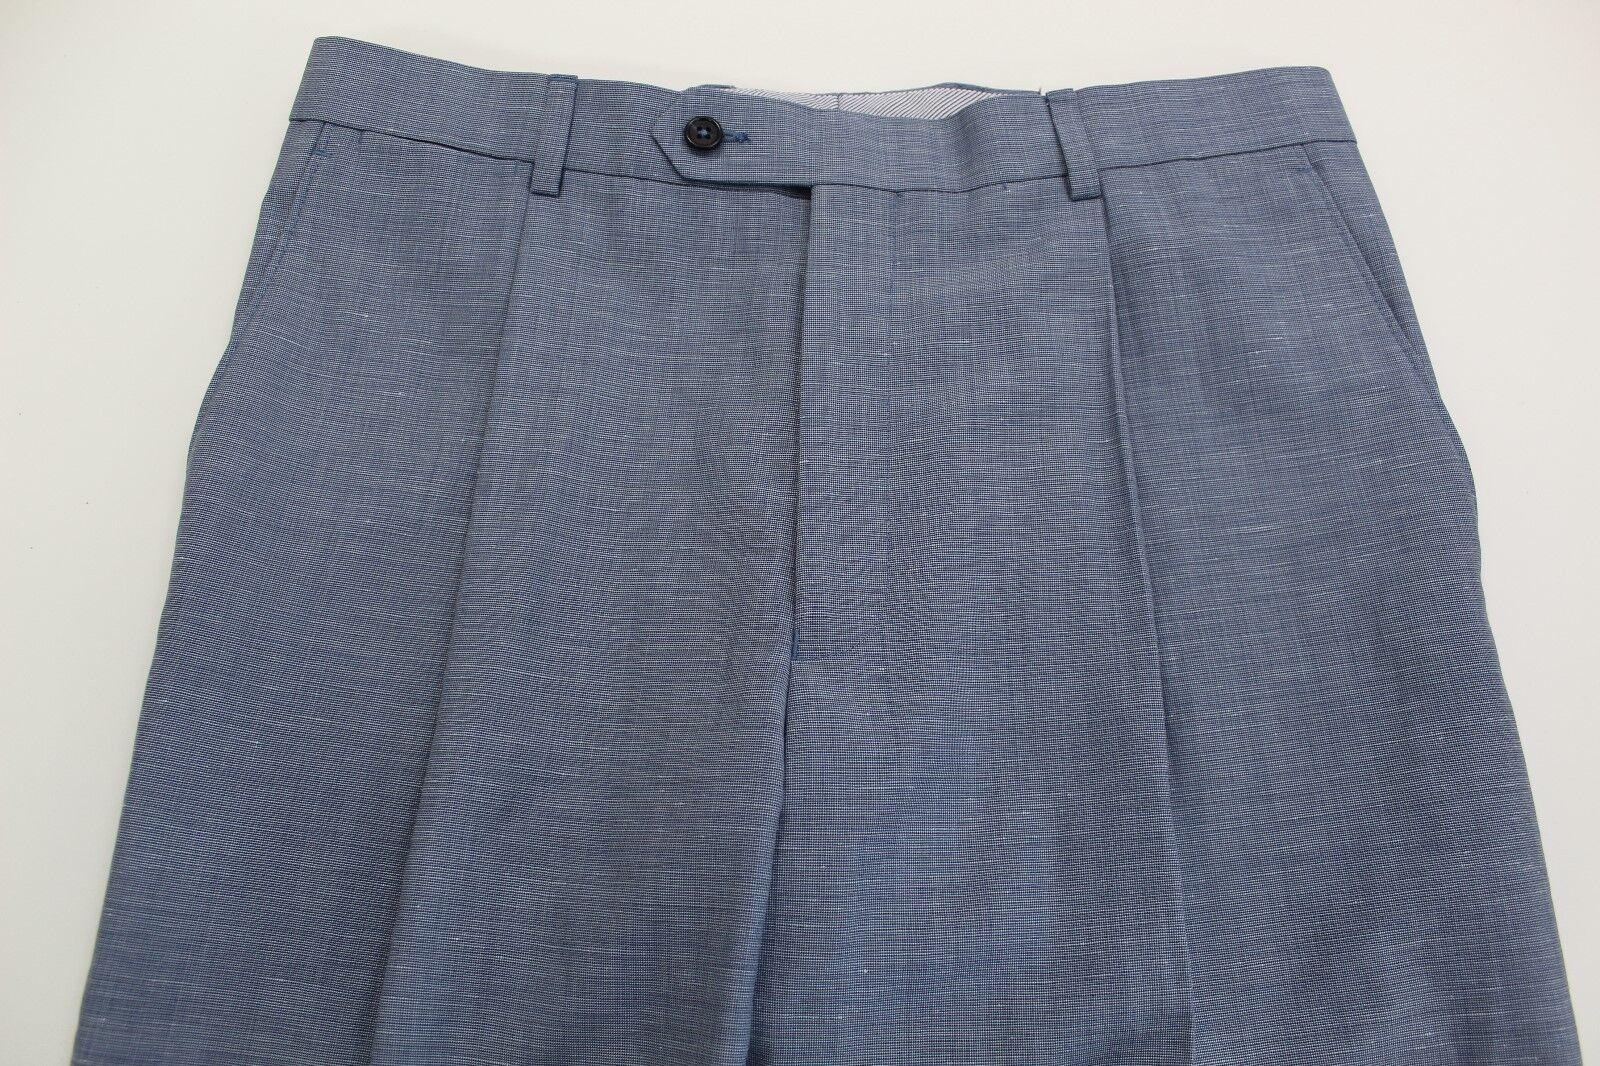 HART SCHAFFNER MARX LINEN WOOL STRAIGHT FIT FLAT FRONT MEN'S PANTS 33 bluee